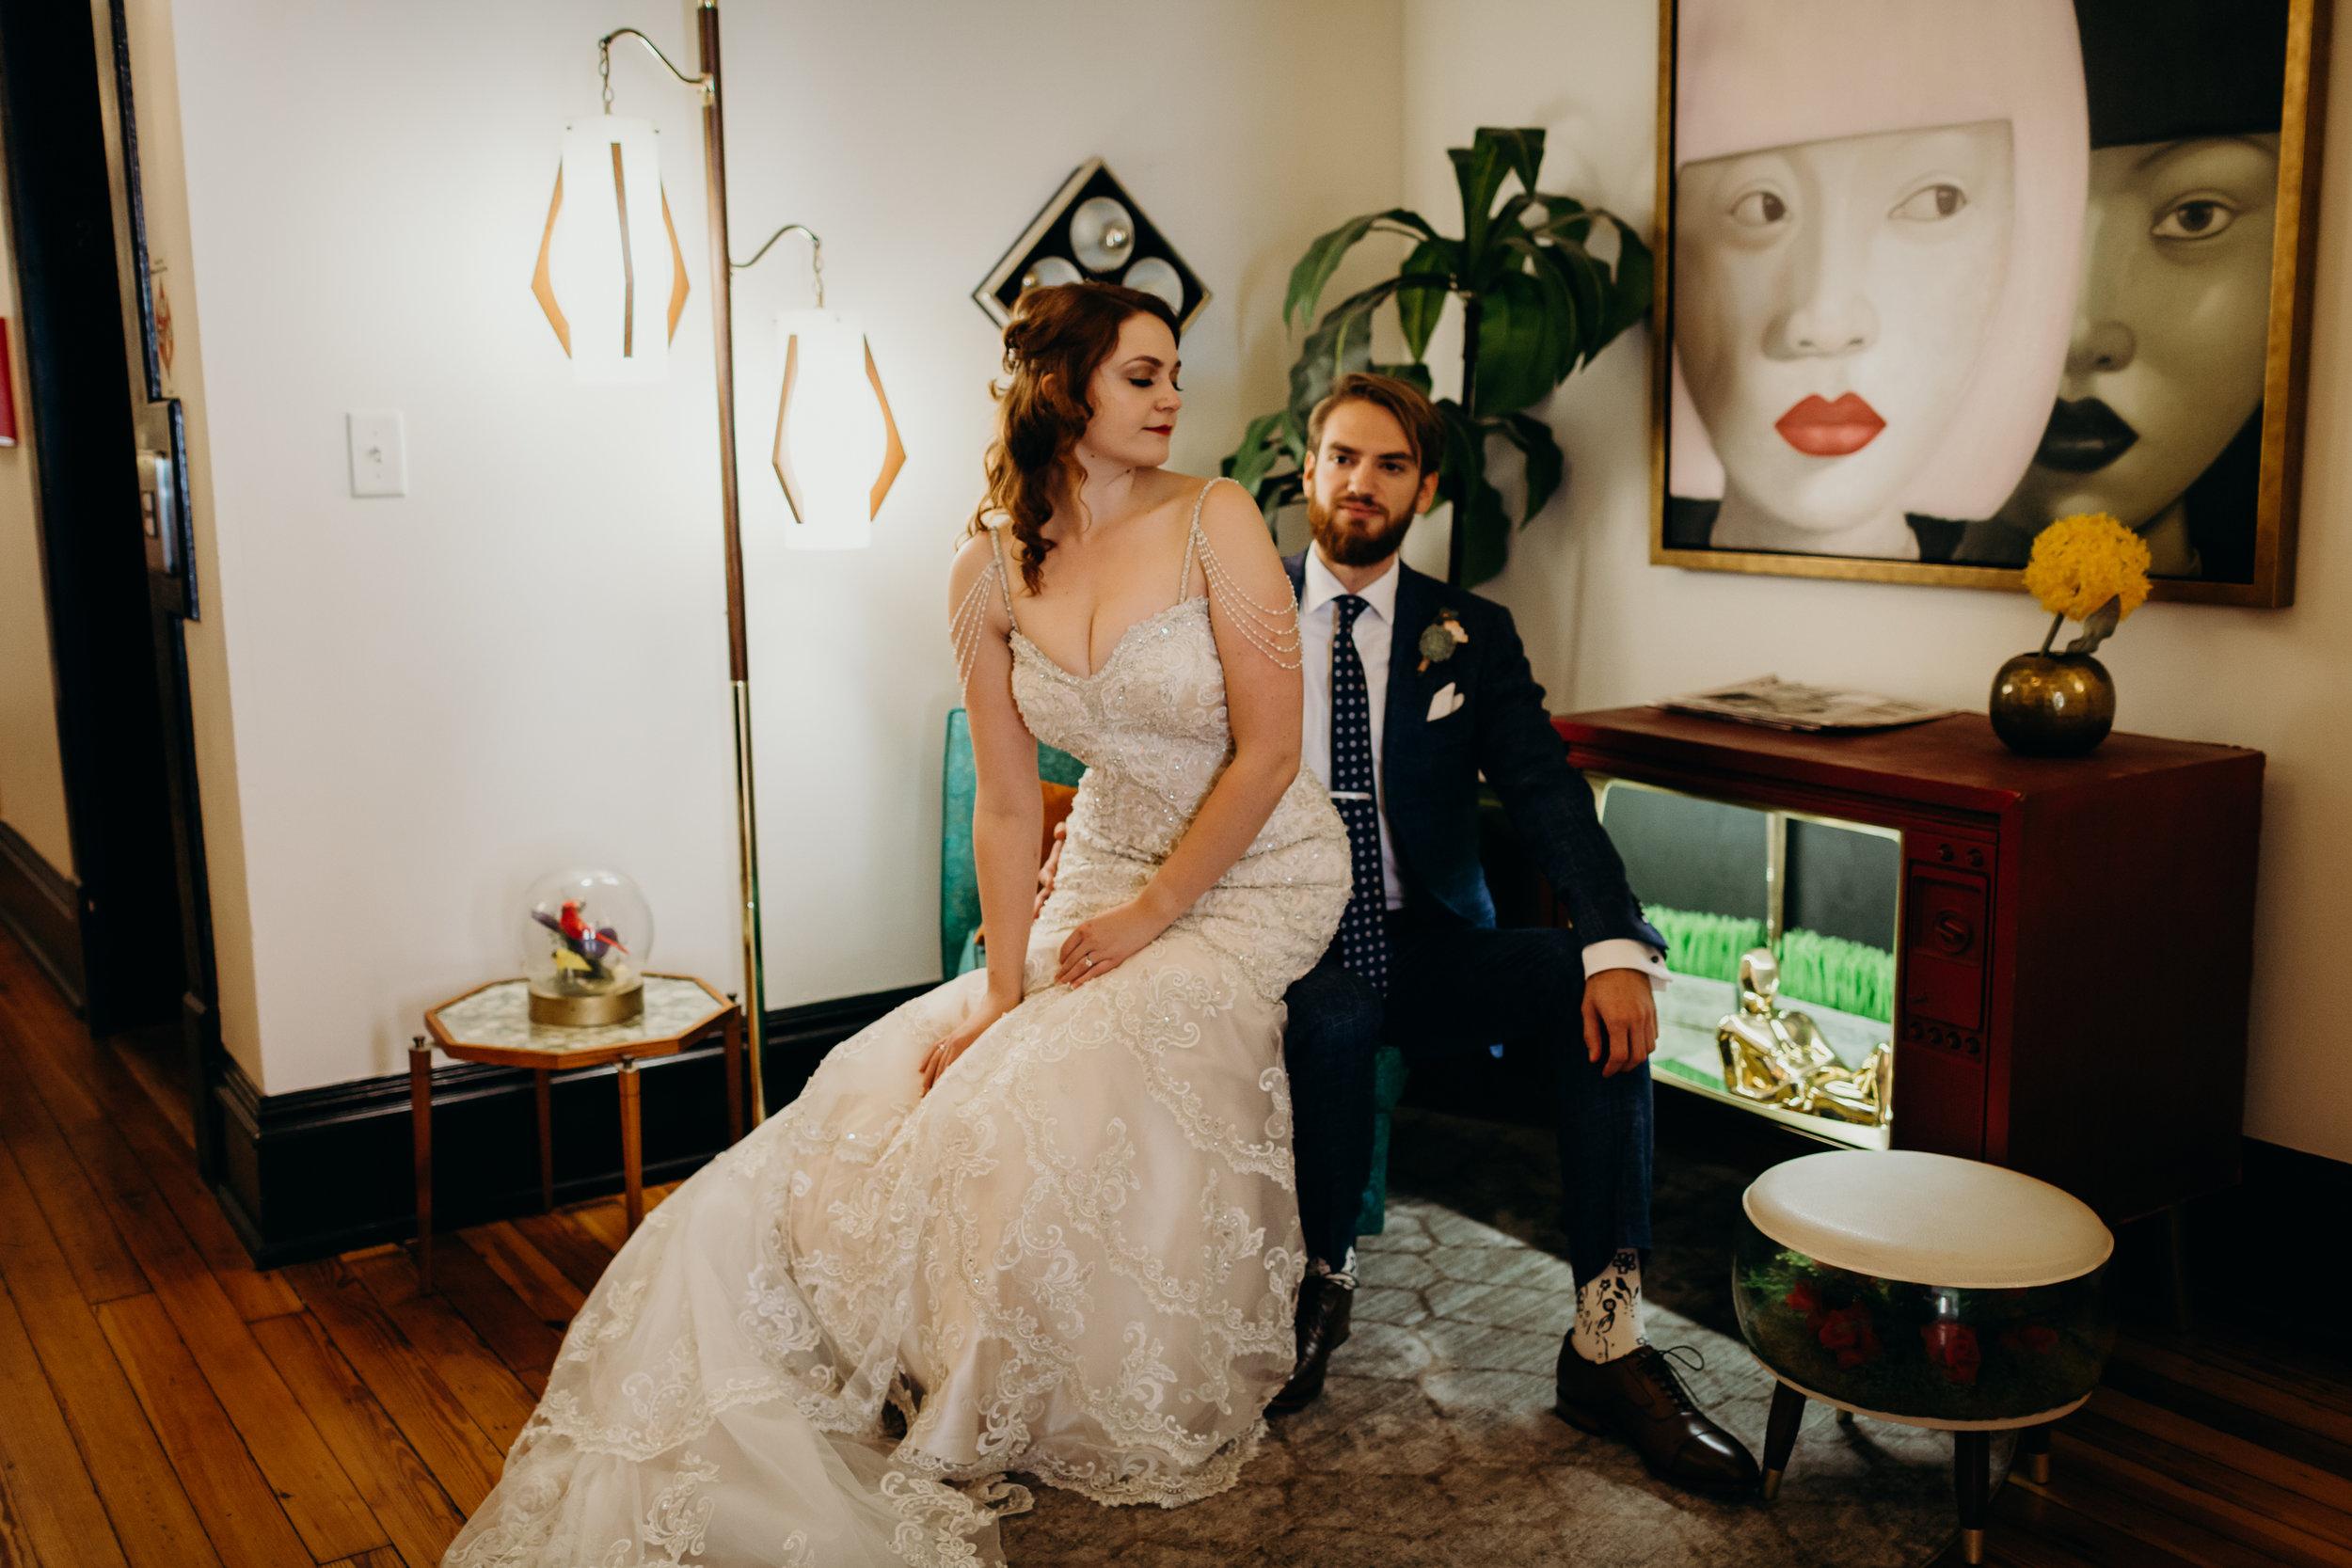 Gianna Keiko Atlanta Chattanooga Destination Wedding Portrait Photographer-33.jpg